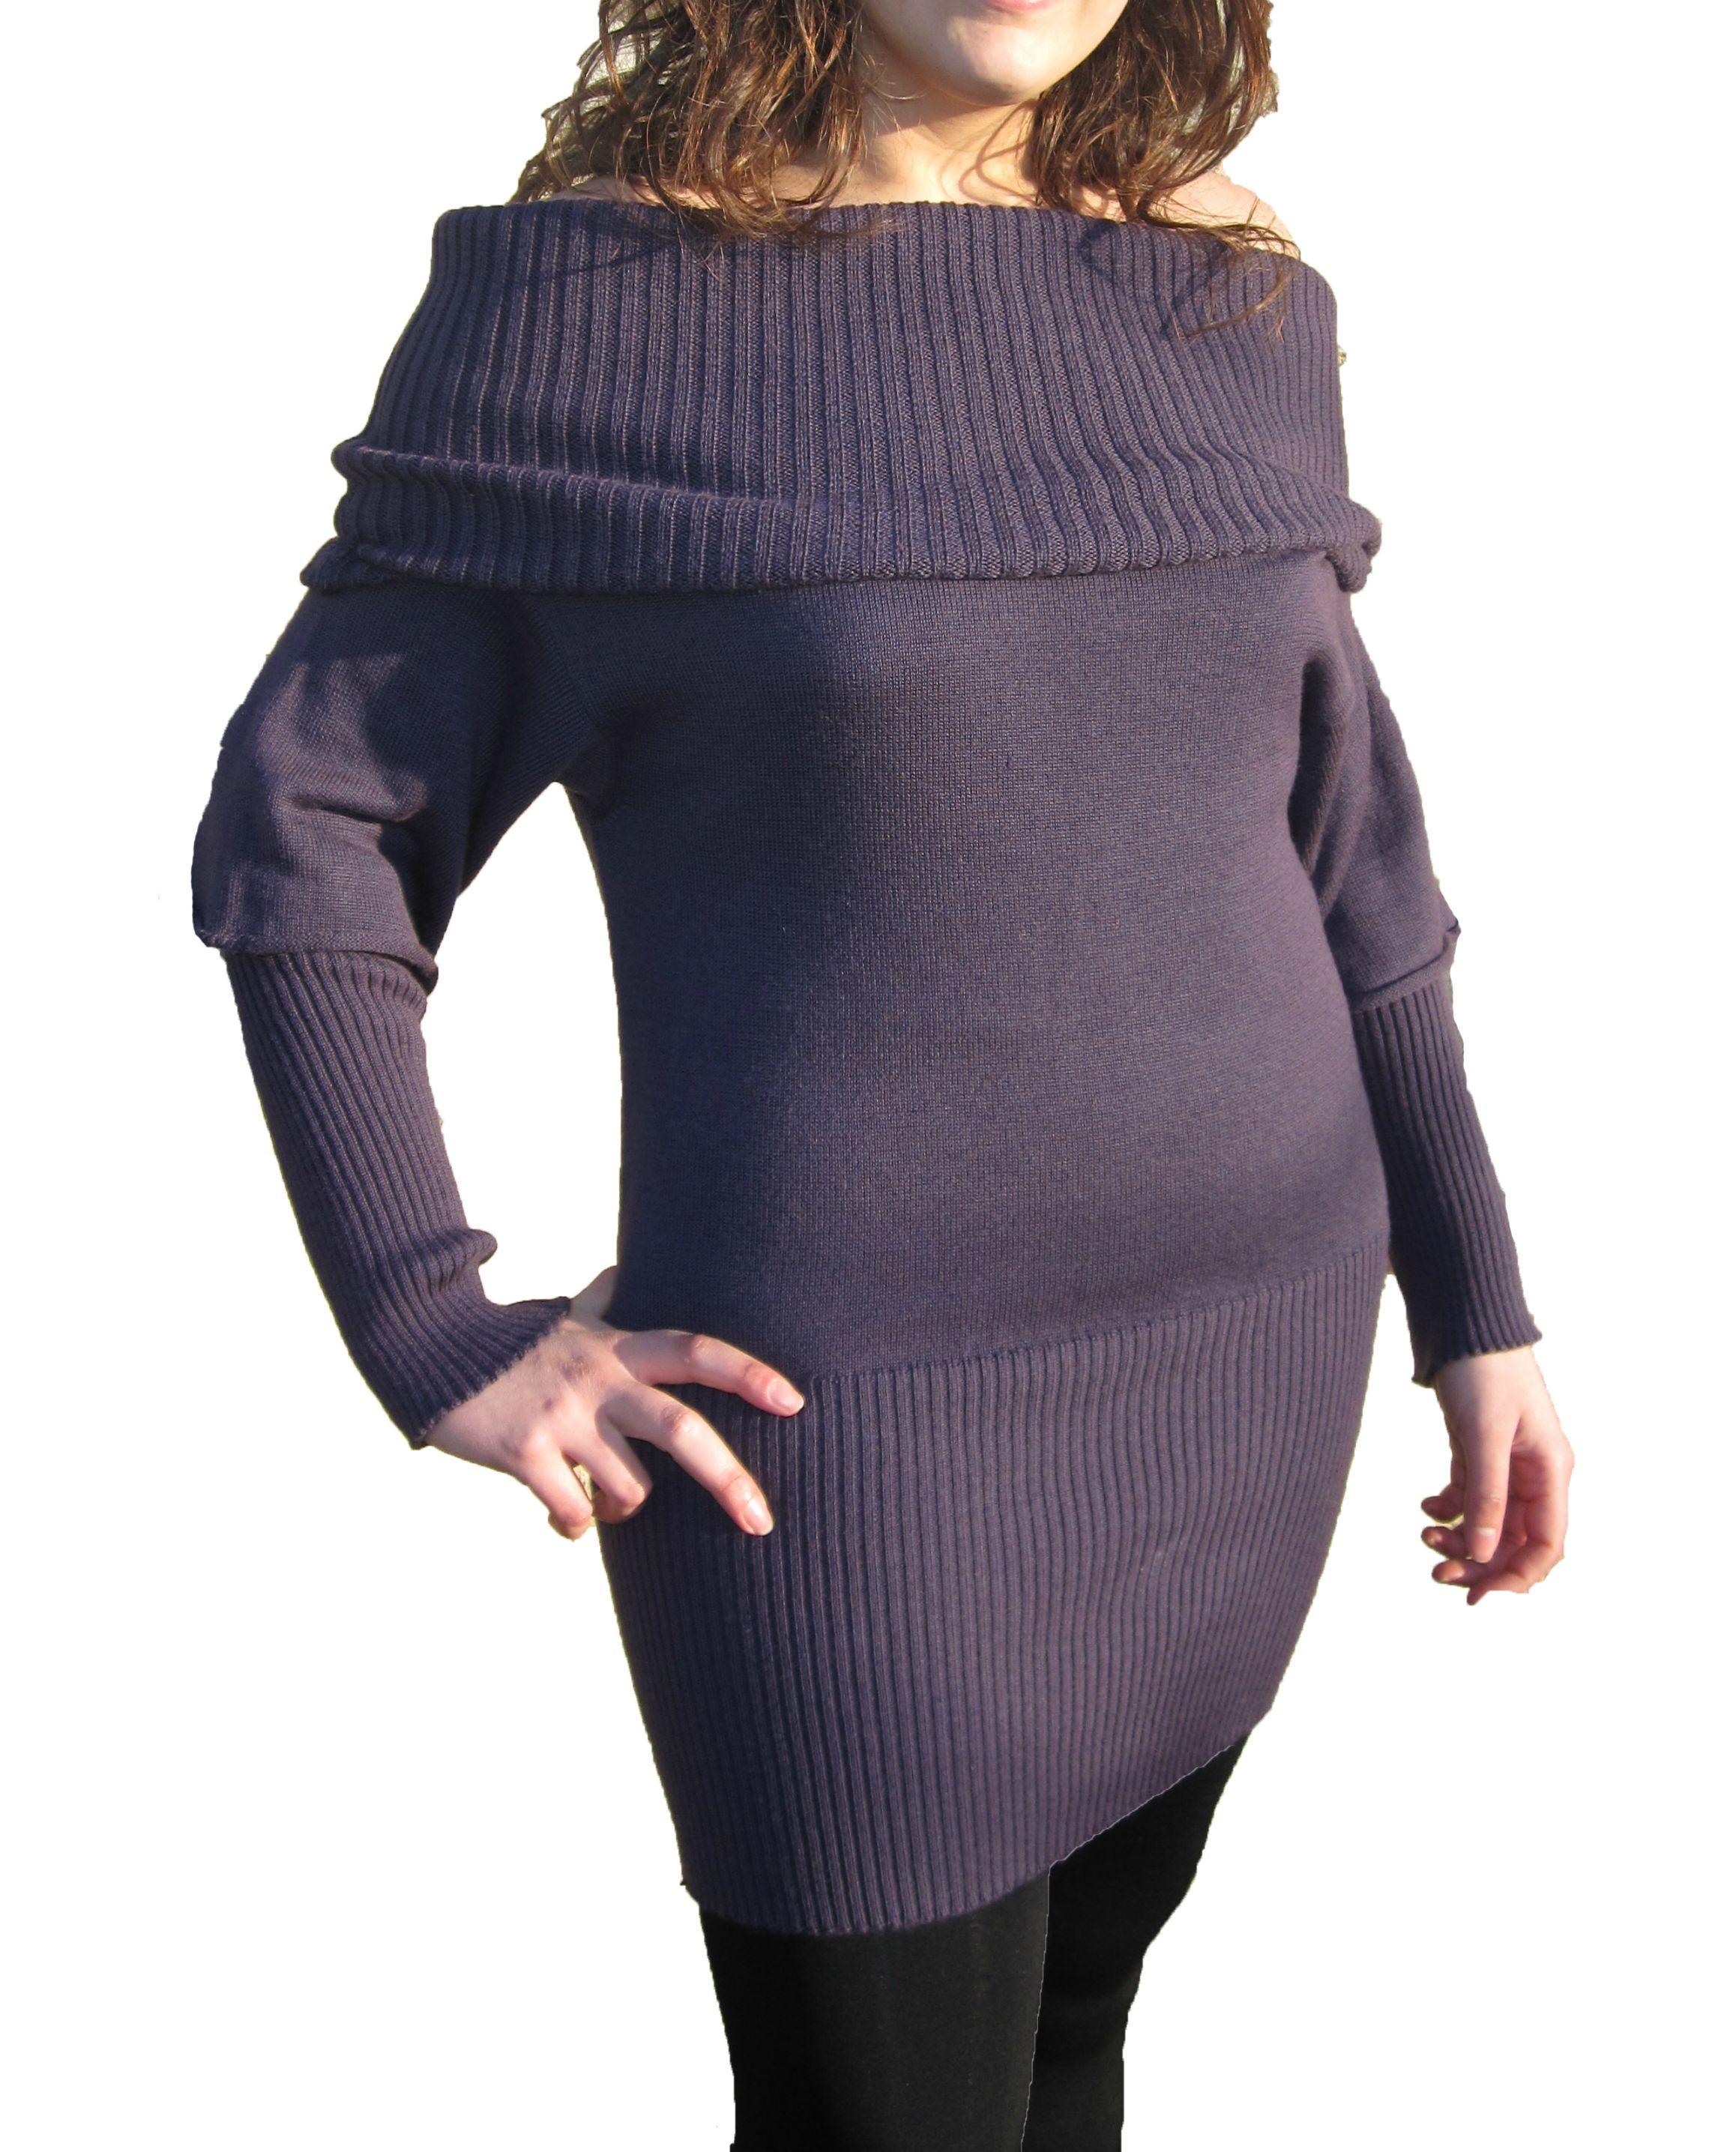 Vestito Viola - Violet Dress